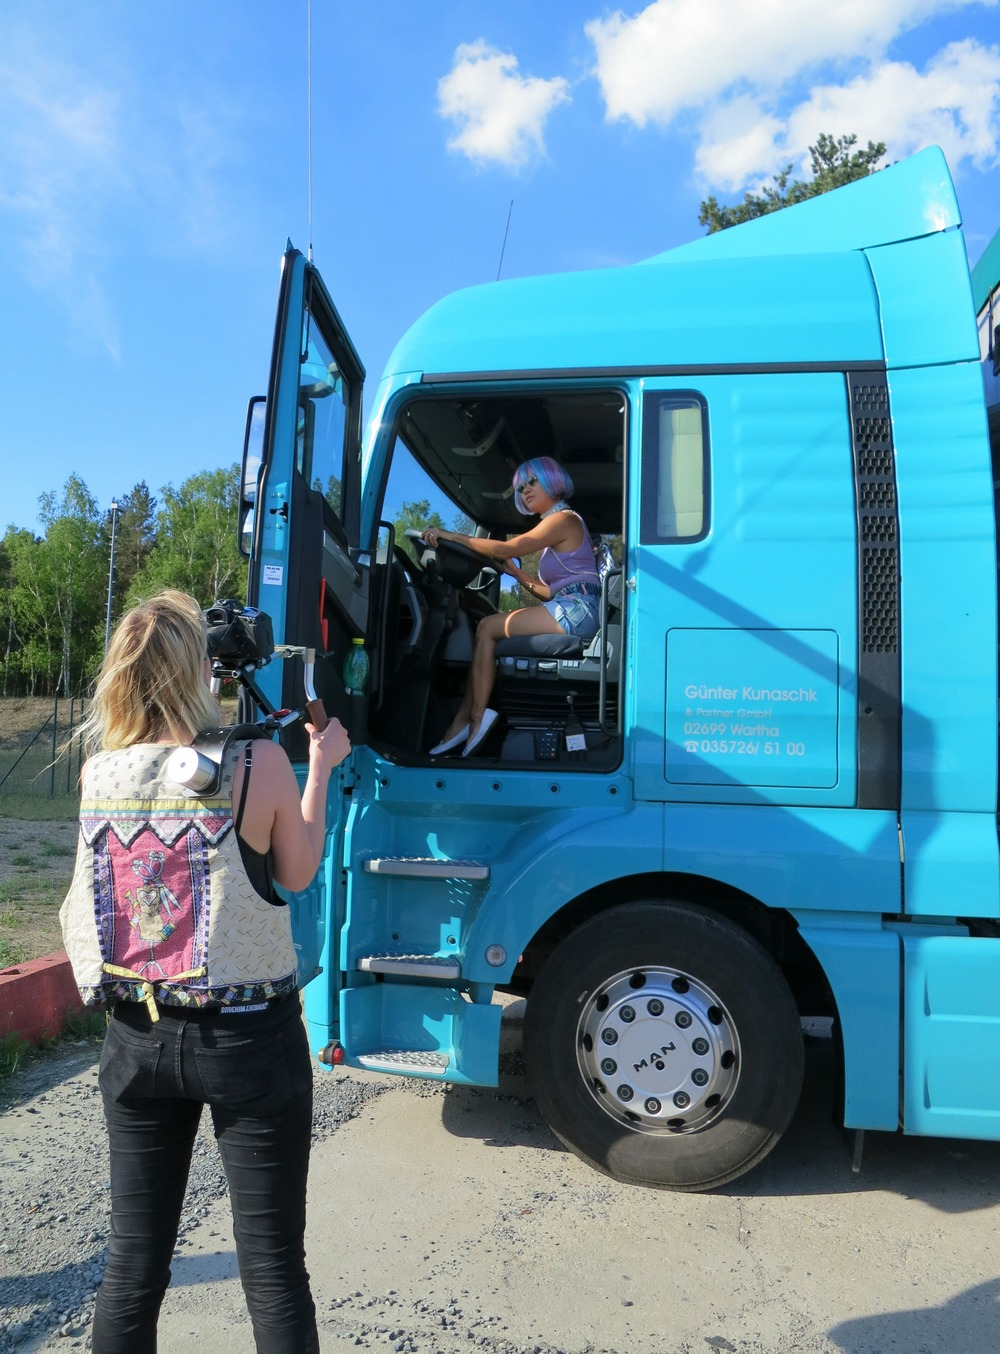 Drivin' truck